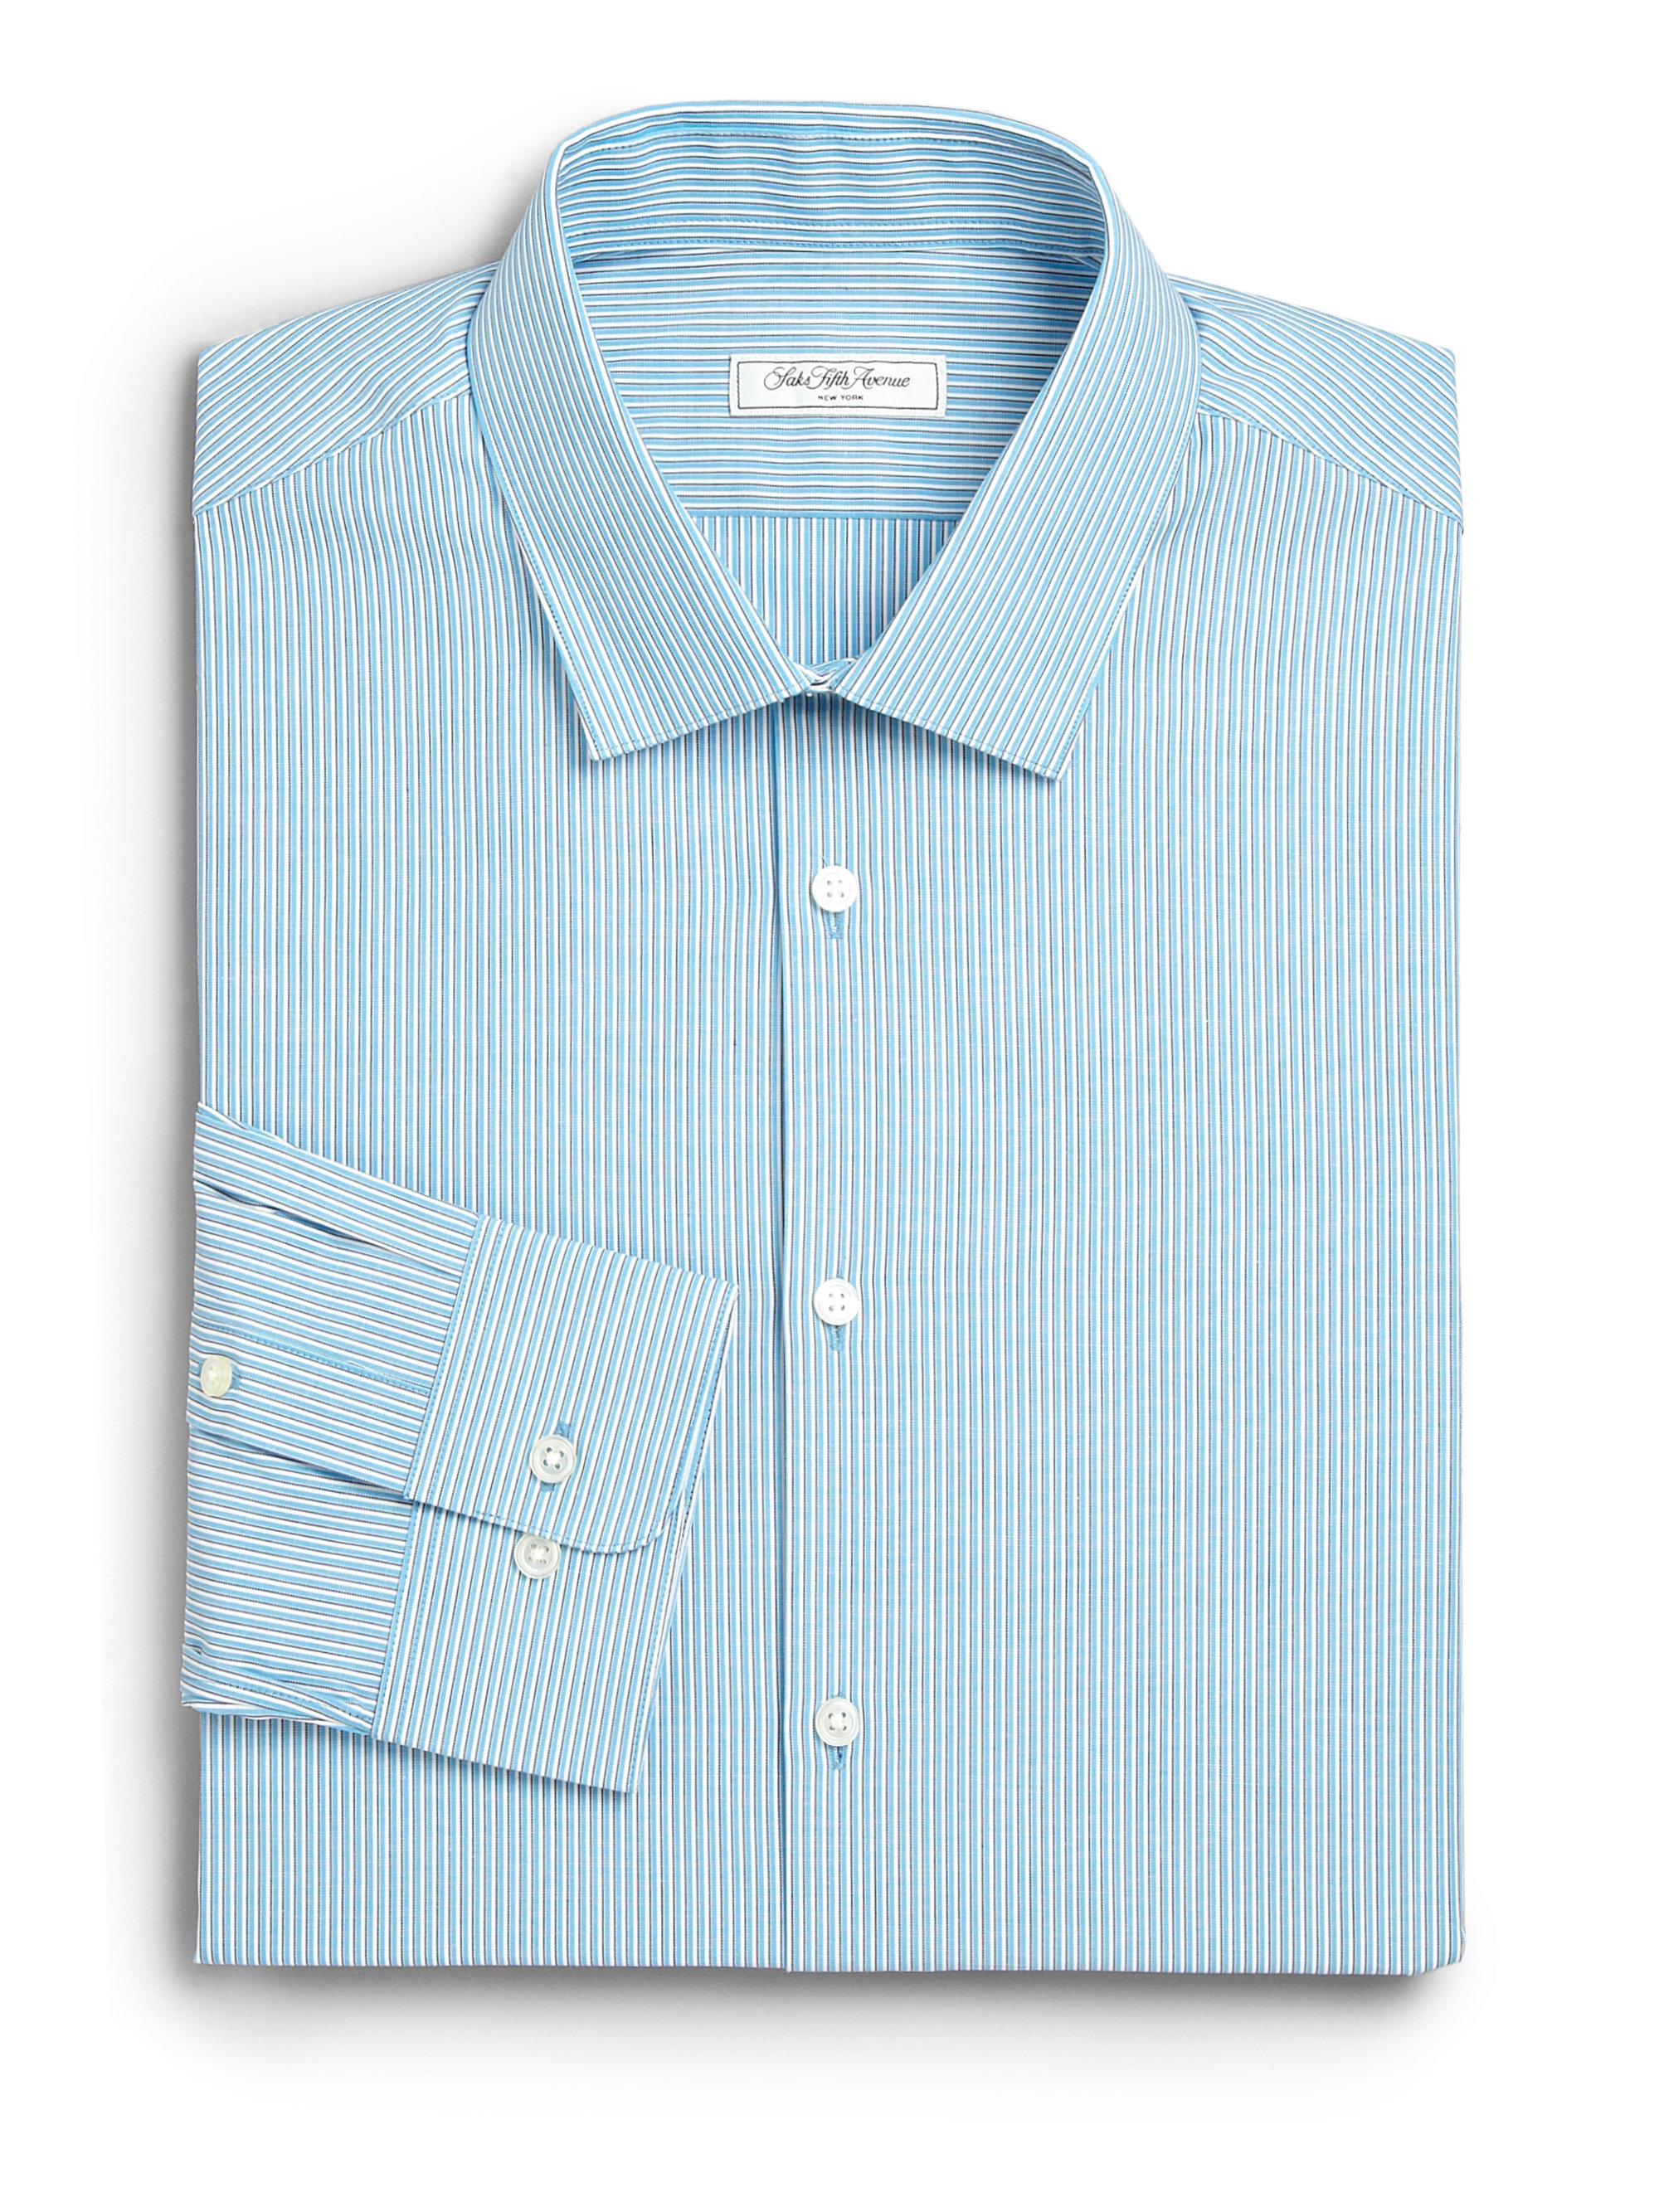 Saks fifth avenue modern fit striped dress shirt in blue for Modern fit dress shirt